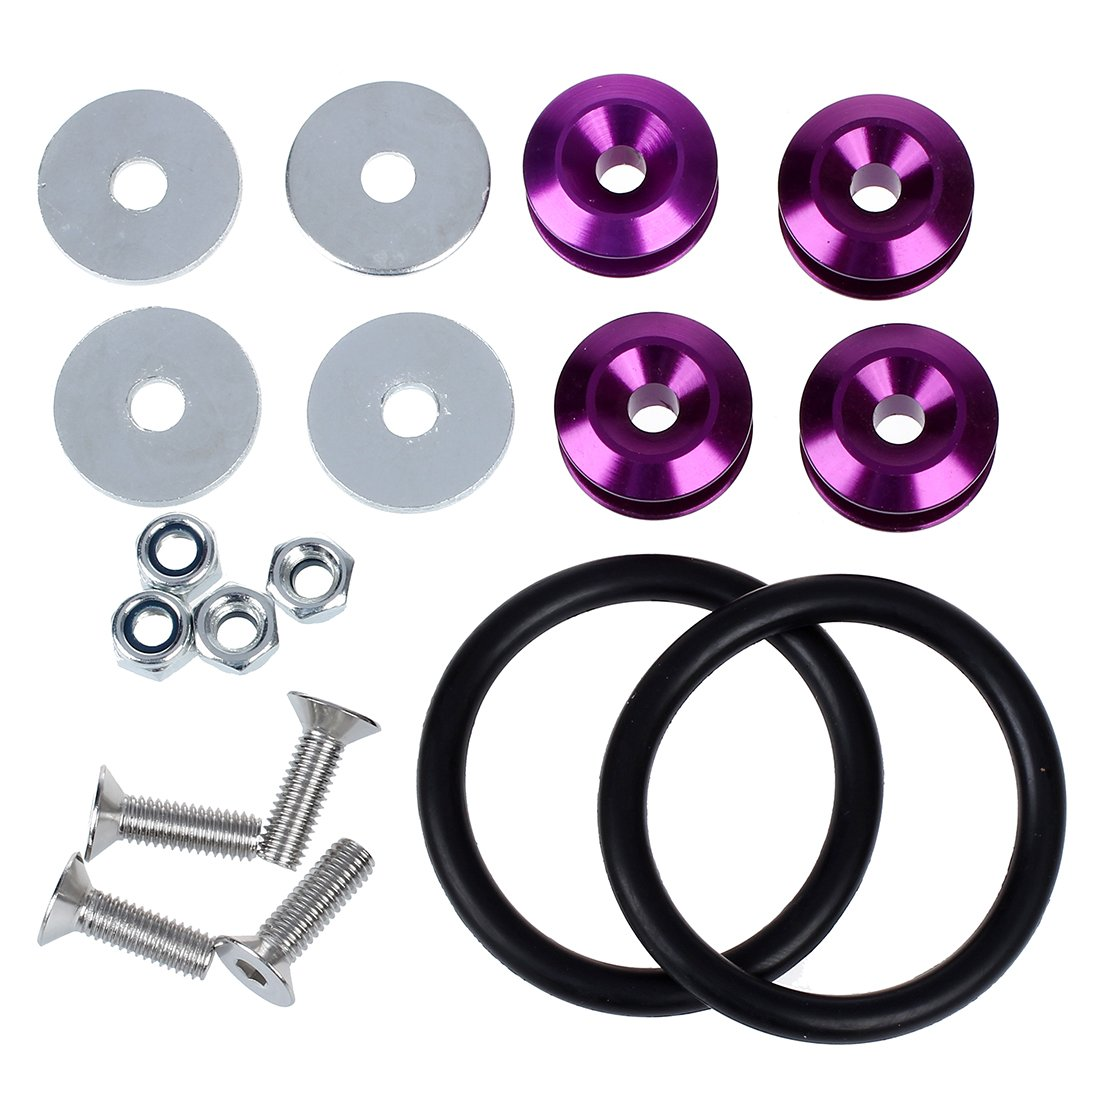 Bolt Loop - SODIAL(R) Purple Quick Release JDM Bumper Fender Trunk Fastener Screw Bolt Loop Ring Kit 059208A2